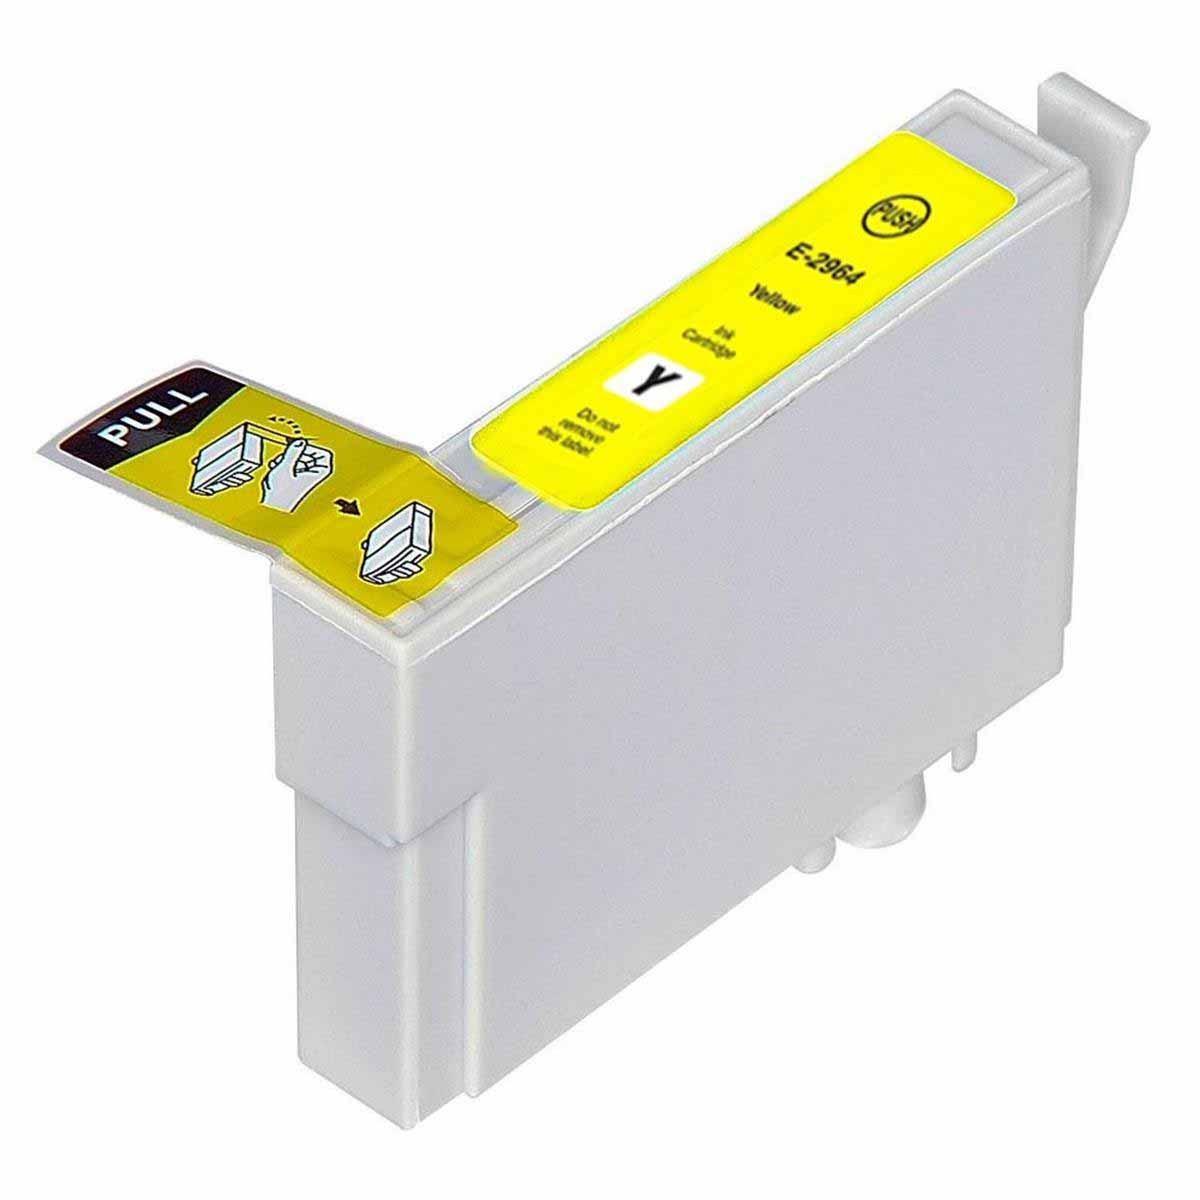 CARTUCHO EPSON T296420 T296 XP-231/XP-241/XP-431/XP441 YELLOW (COMPATÍVEL)